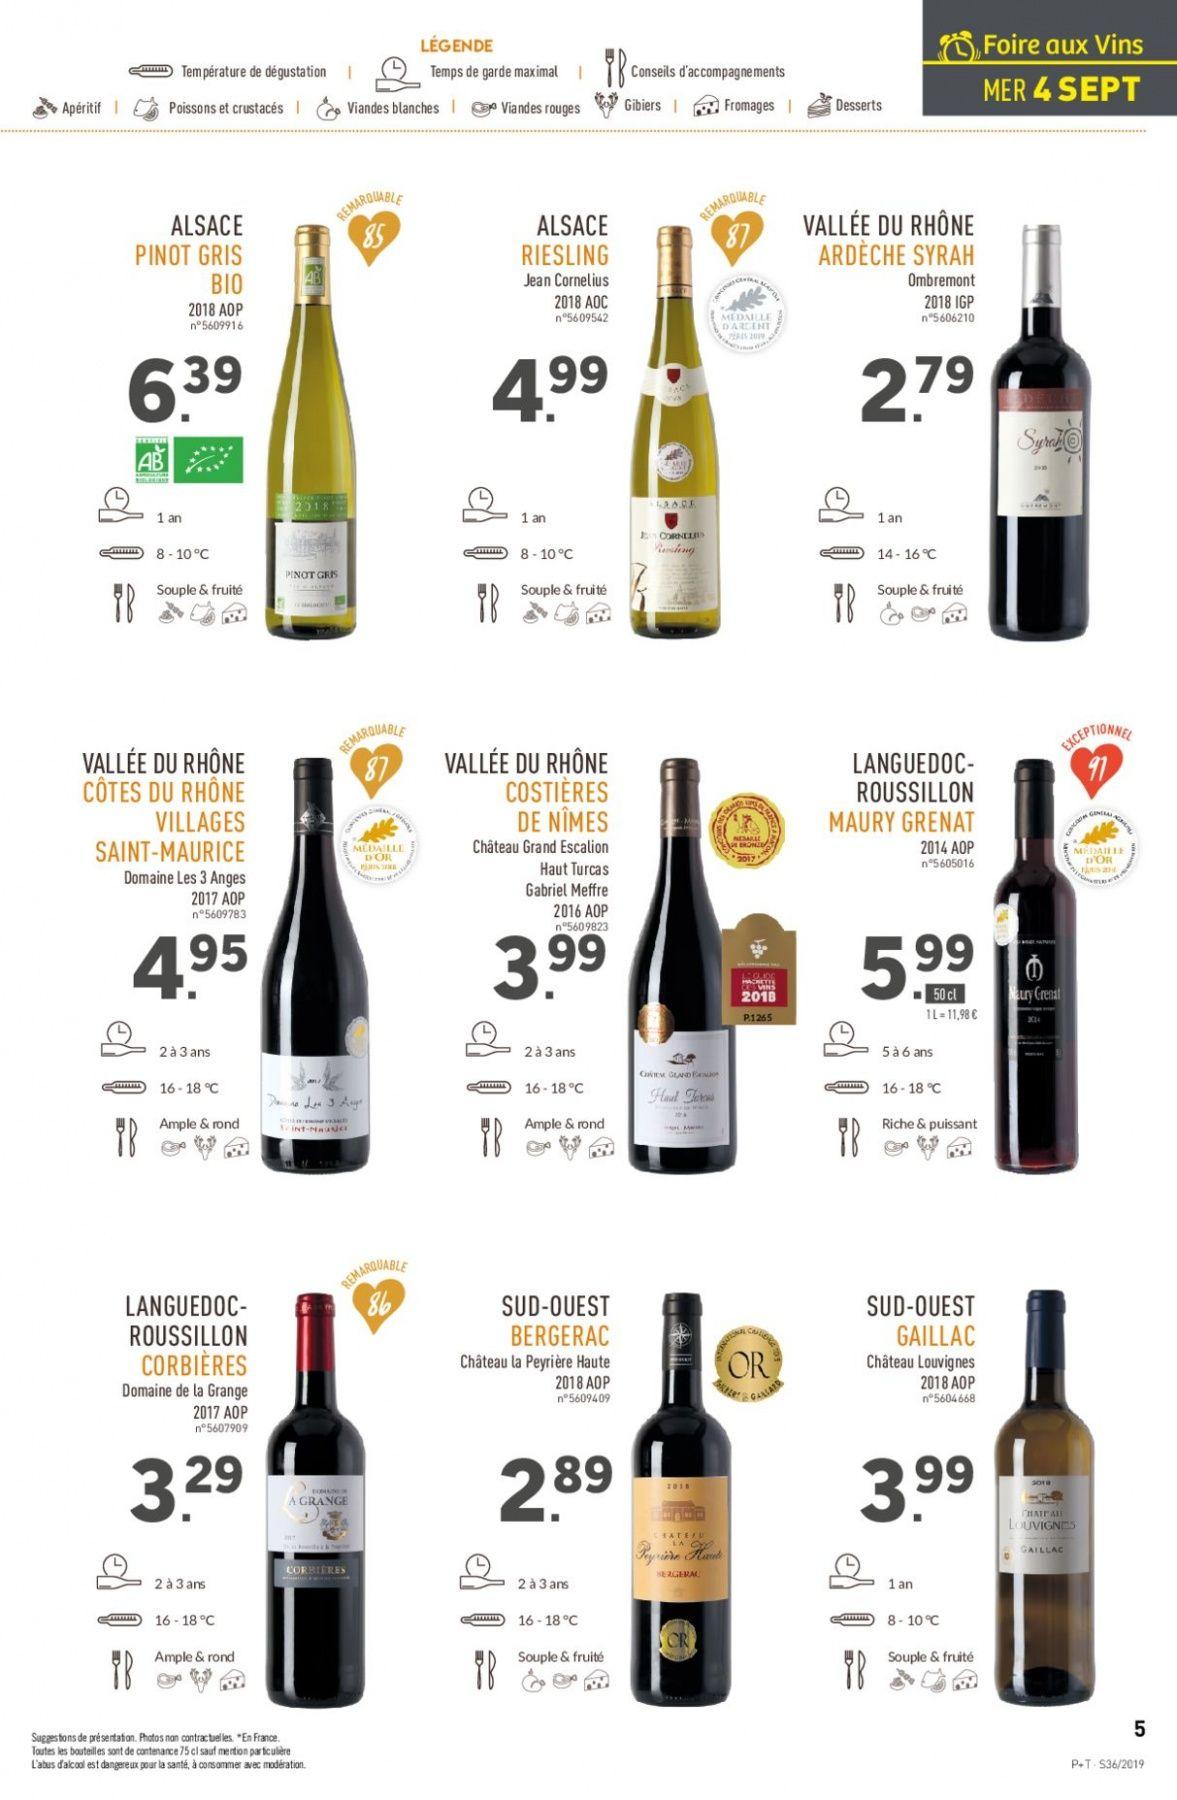 Foire Aux Vins Lidl 2020 : foire, LIDL.SI, KATALOG, Katalog, živila, Vsikatalogi.si, Issuu